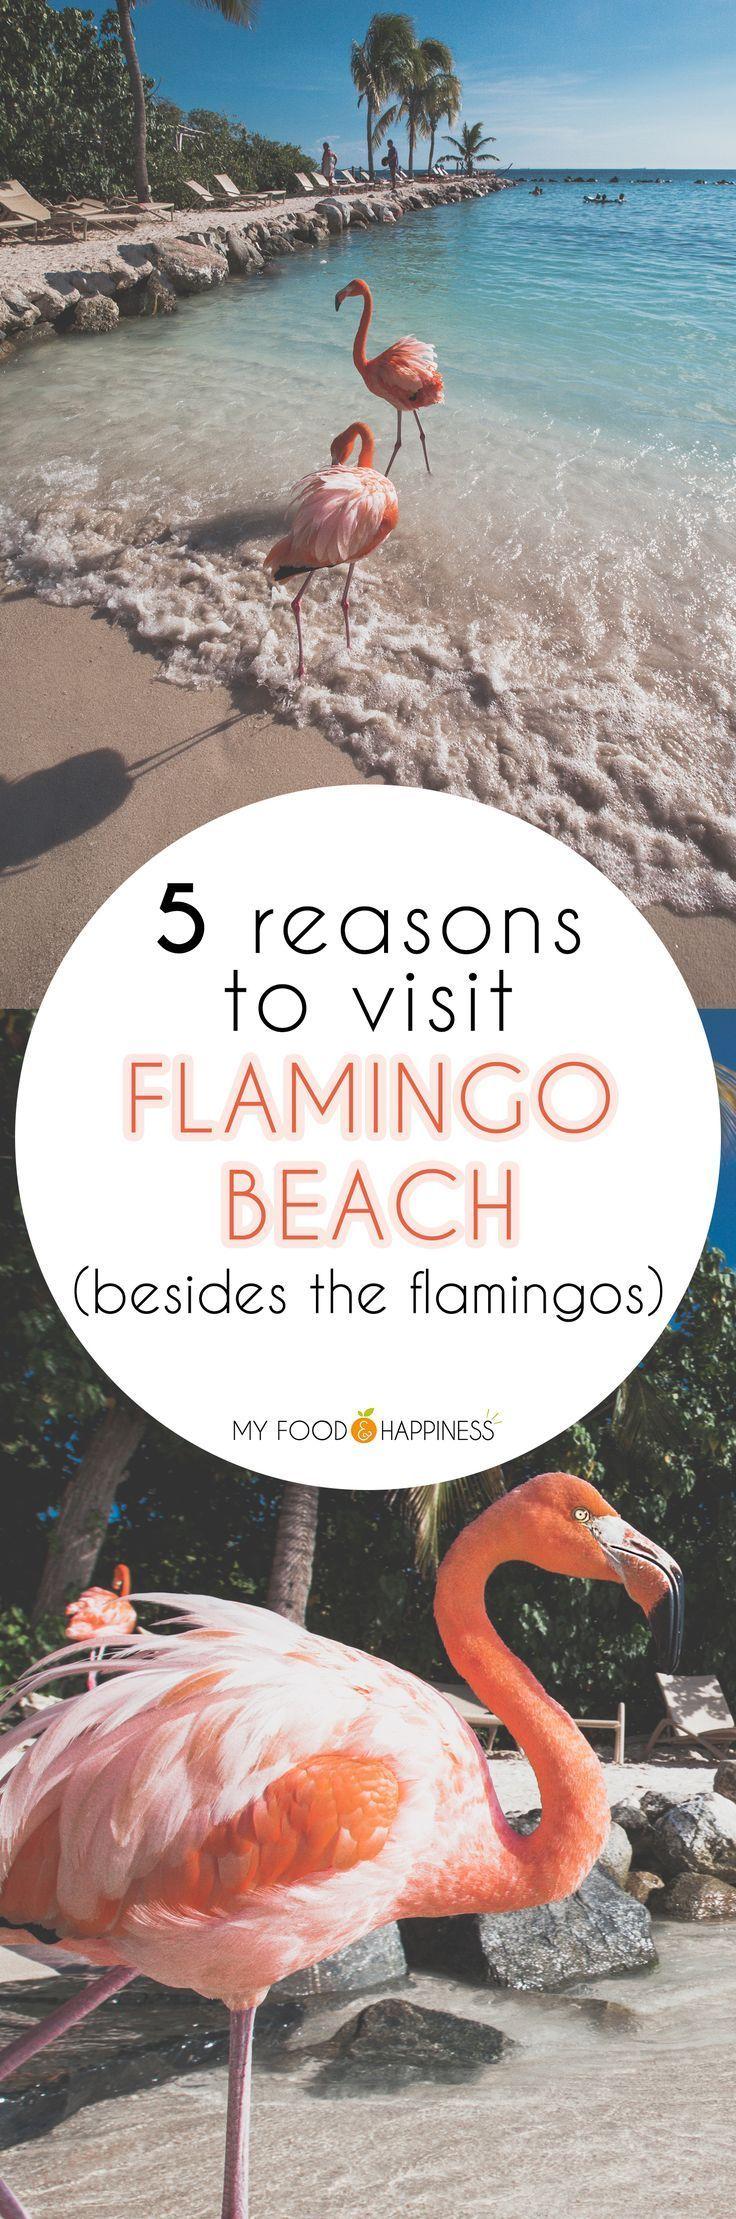 5 Reasons to visit Flamingo beach in